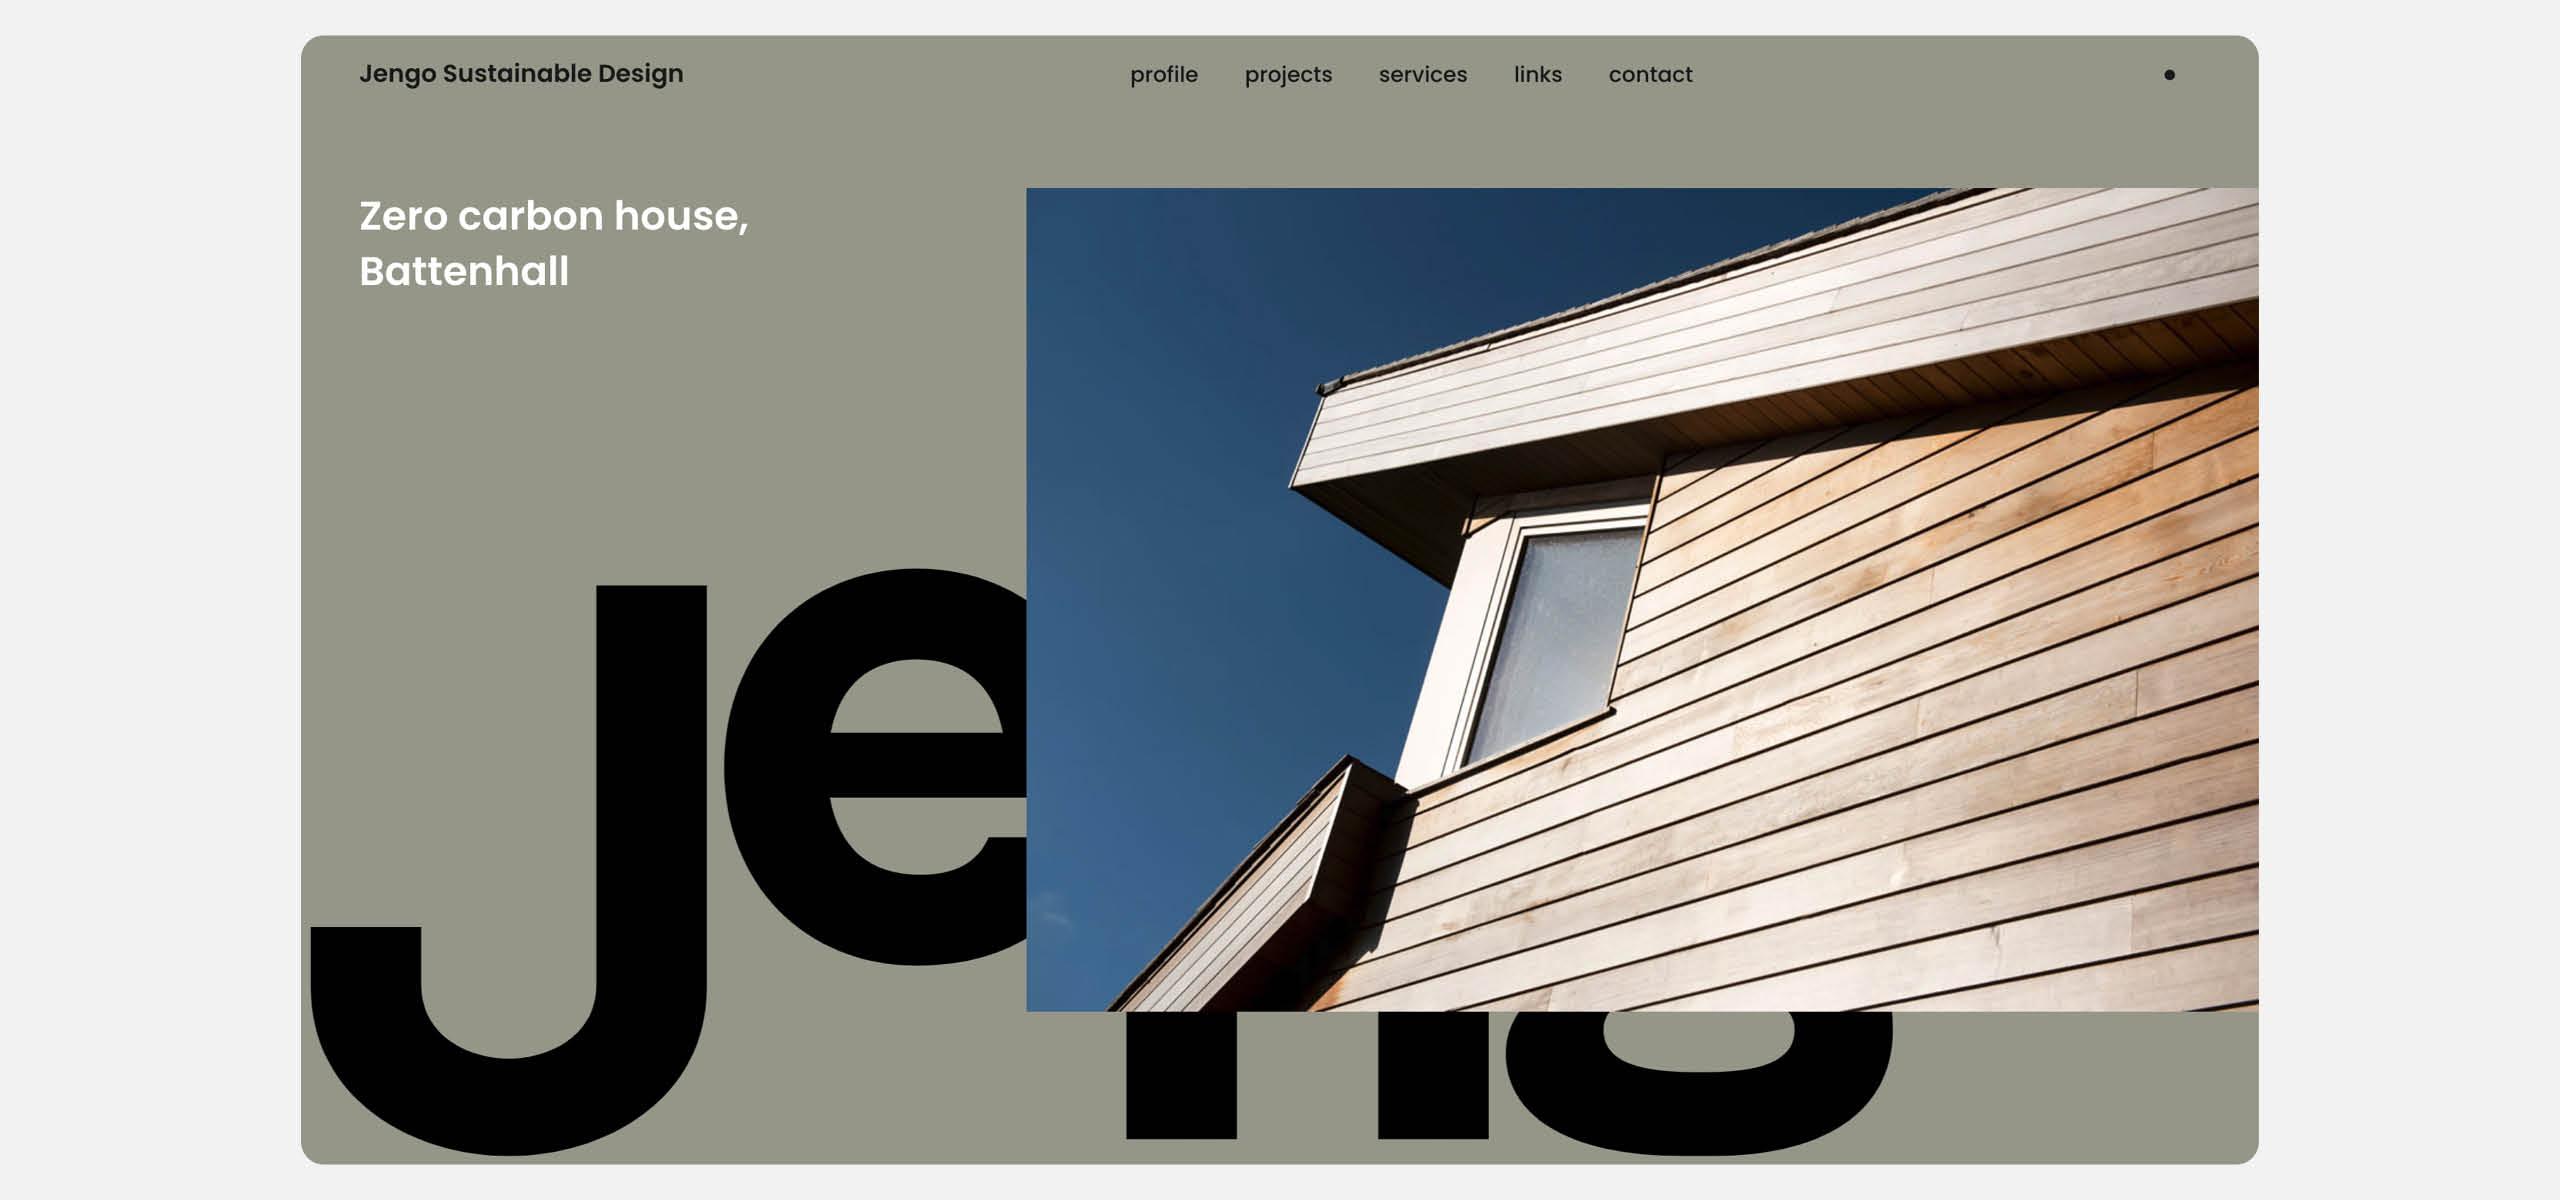 Jengo Sustainable Design